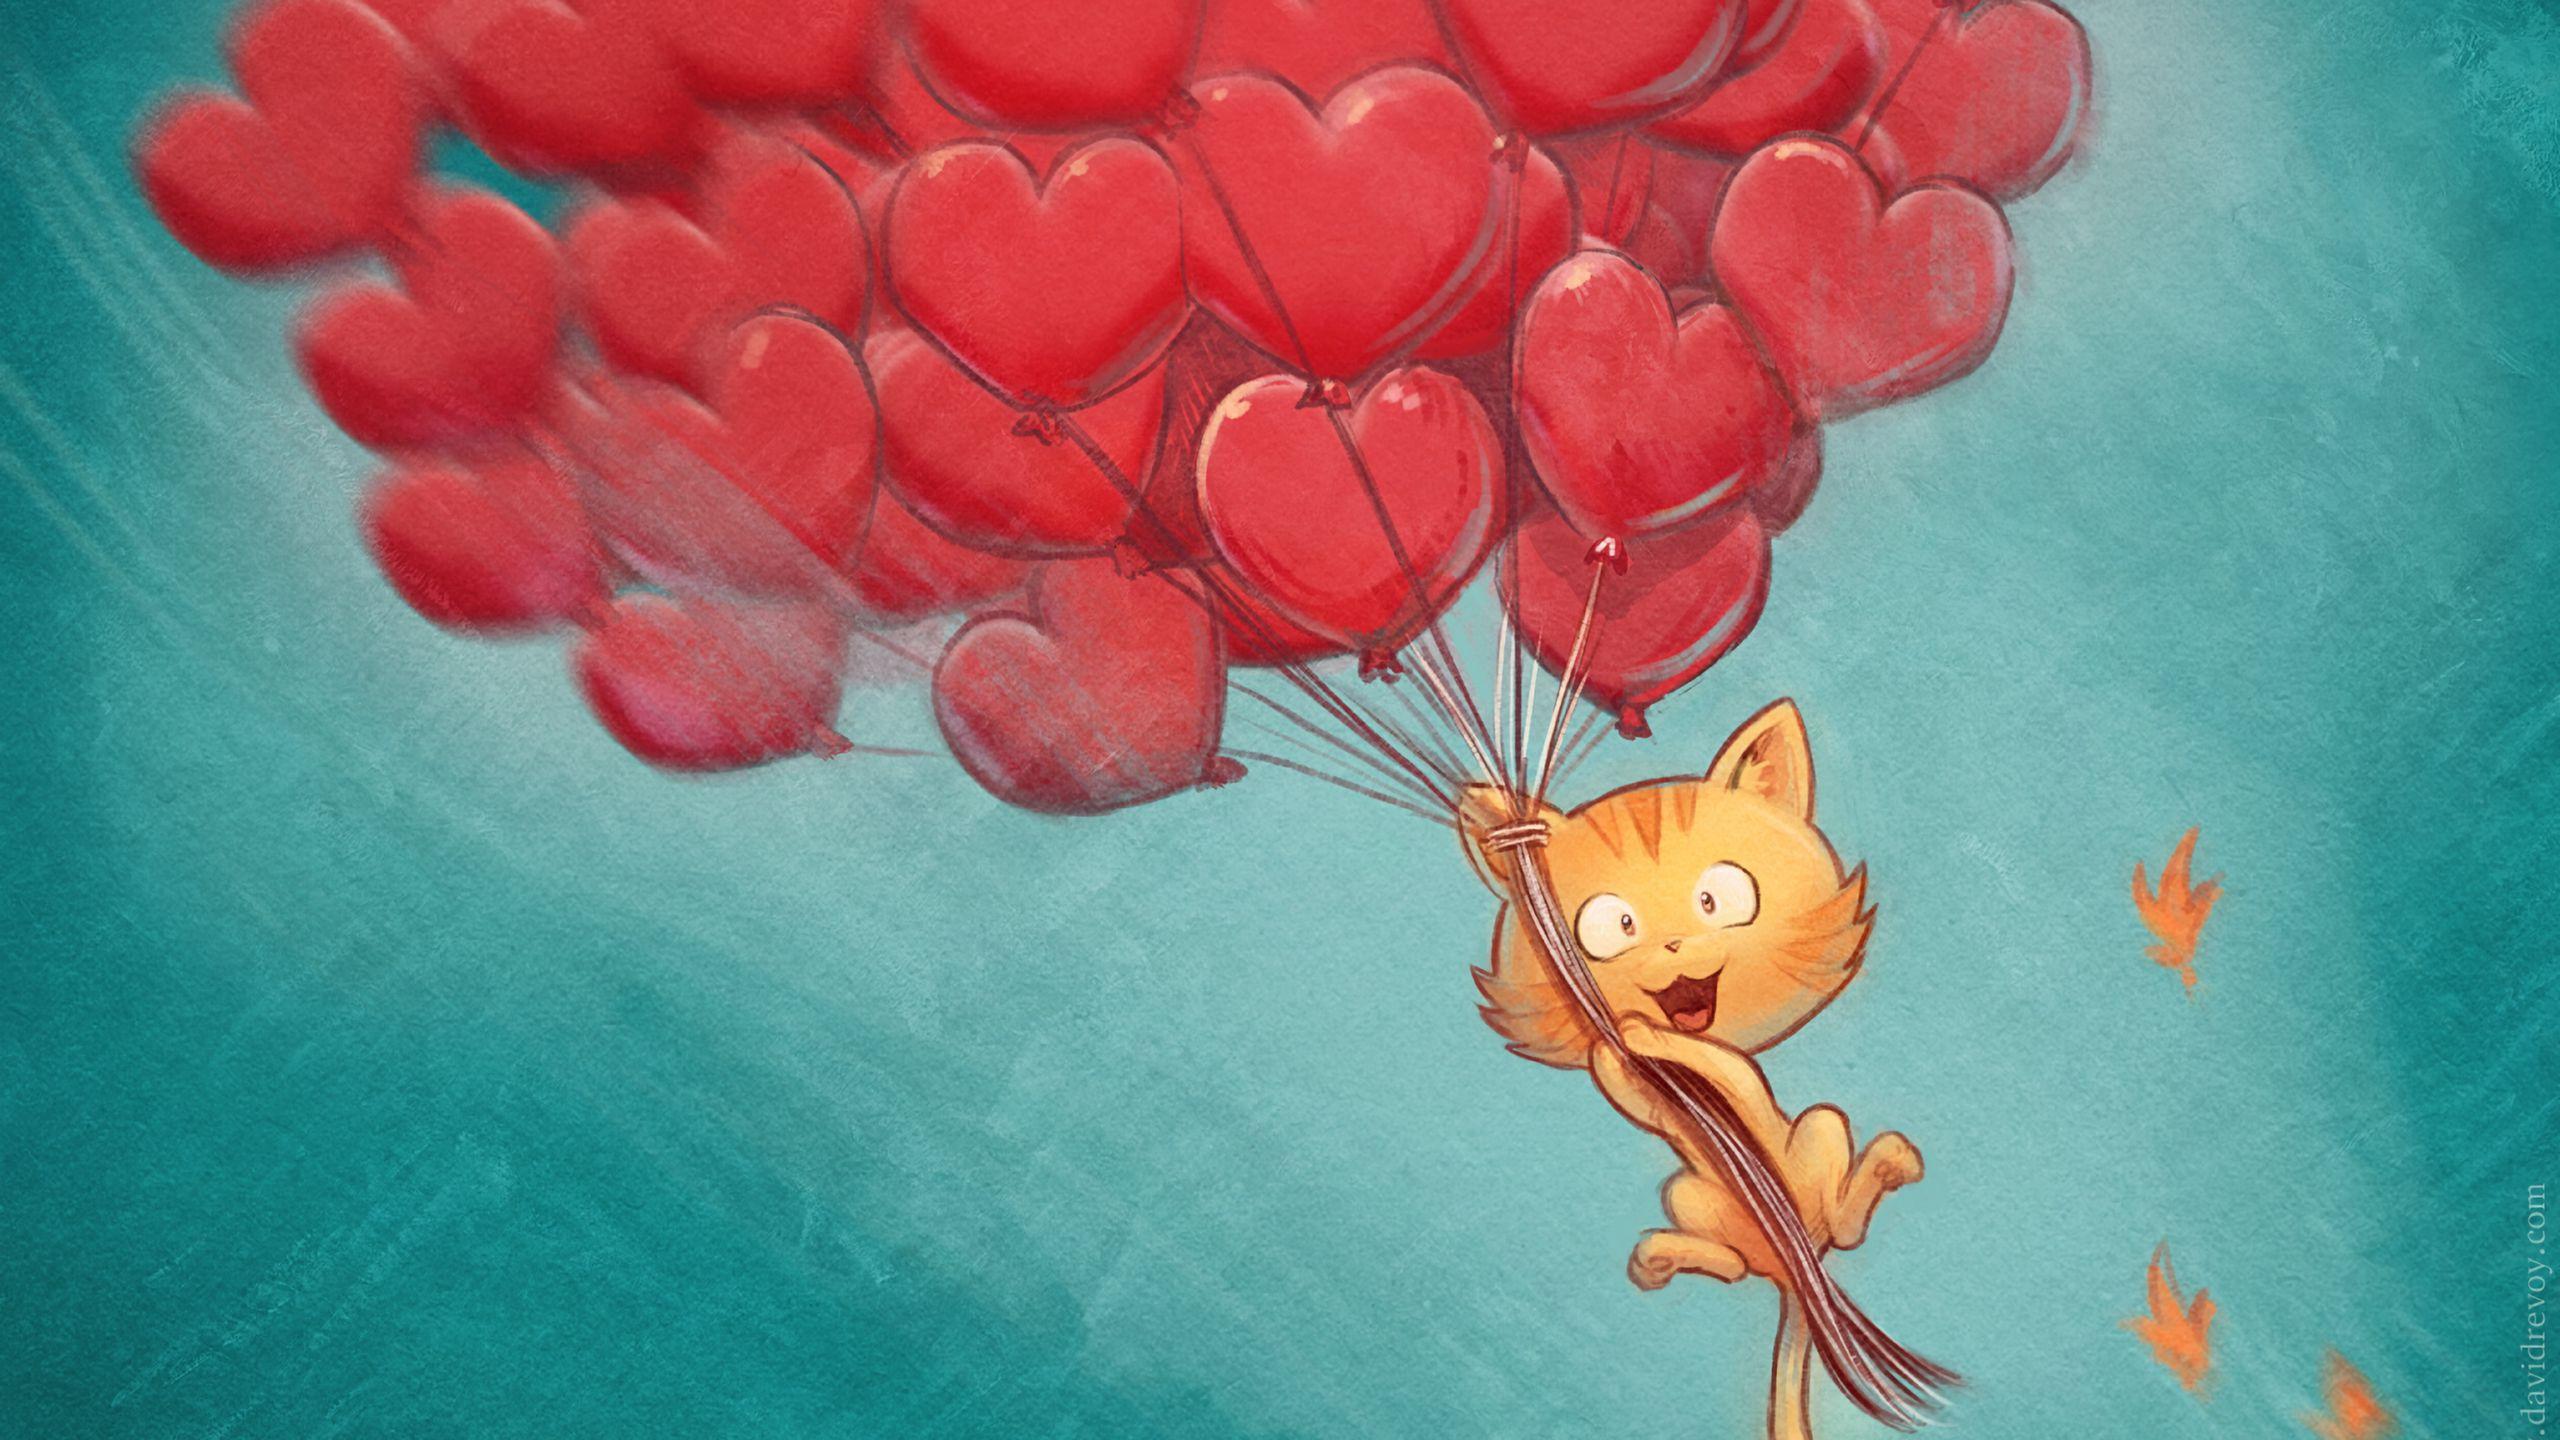 2560x1440 Wallpaper cat, balloons, hearts, flight, sky, art